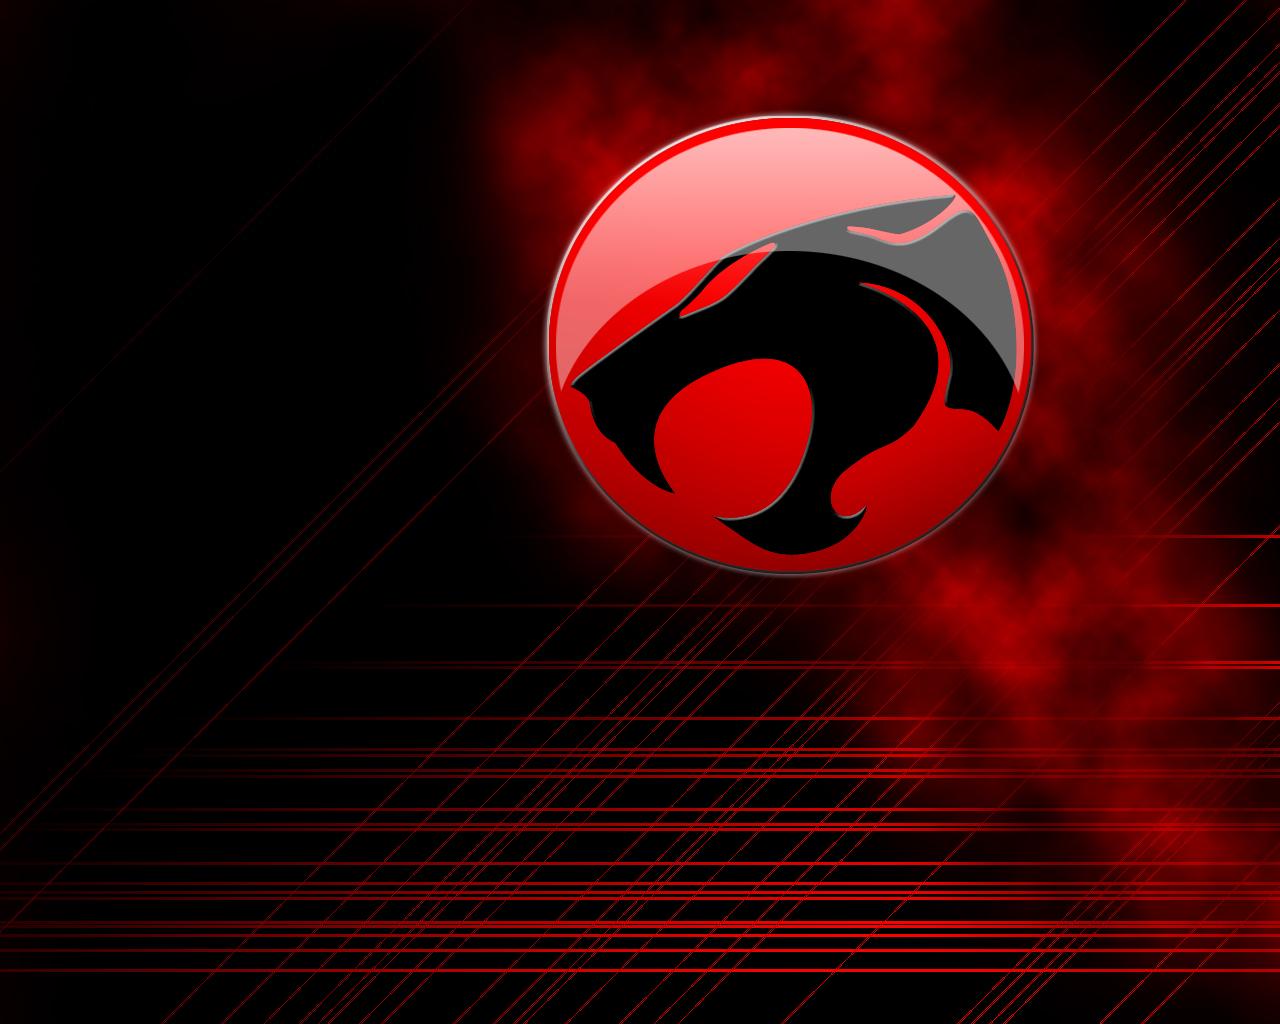 Red Logo Thundercats Wallpaper HD wallpaper   Red Logo Thundercats 1280x1024